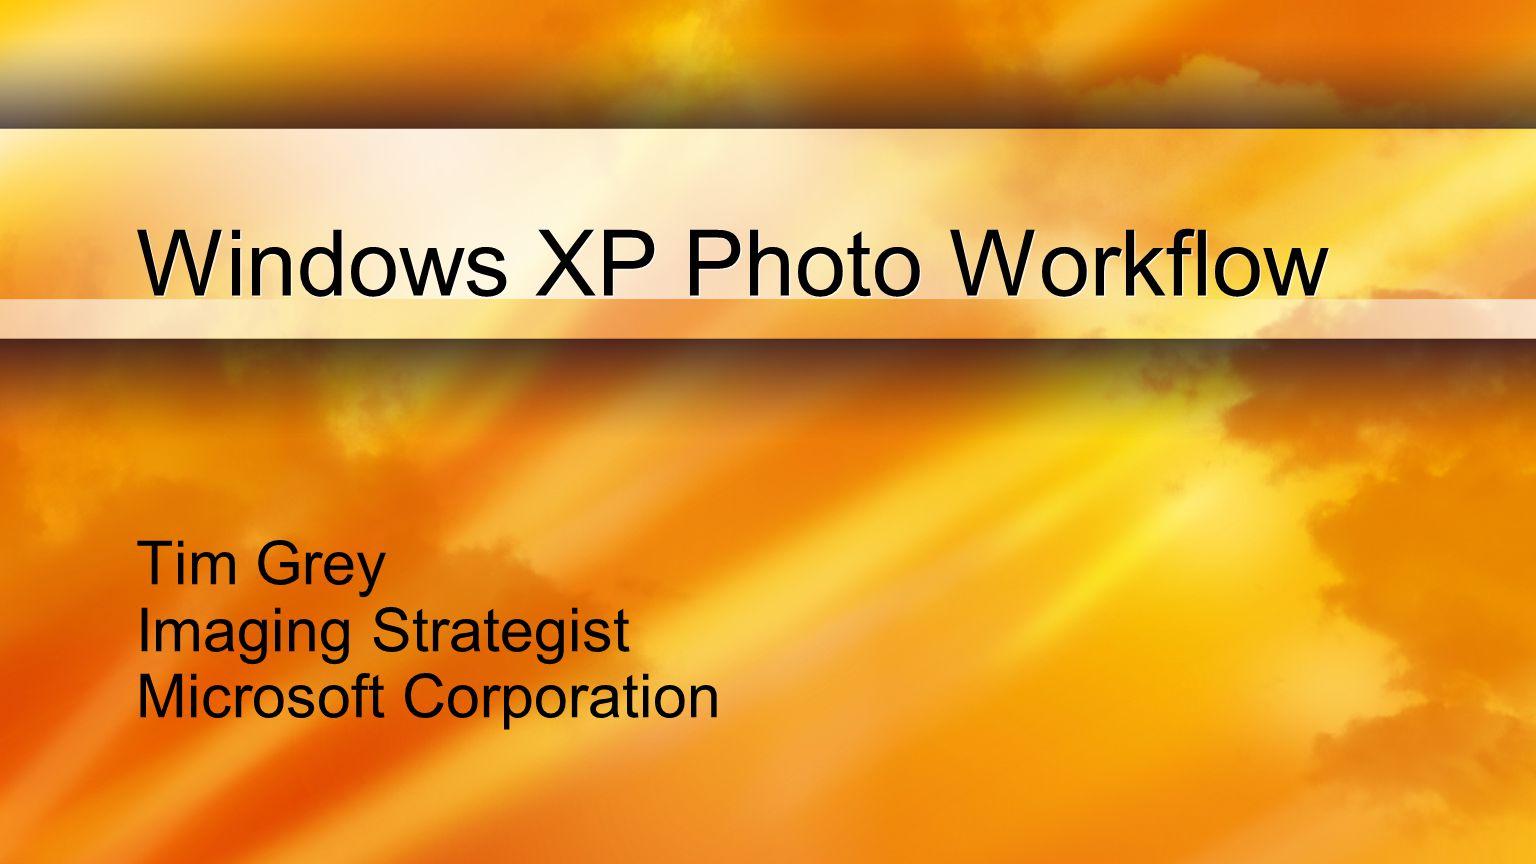 Windows XP Photo Workflow Tim Grey Imaging Strategist Microsoft Corporation